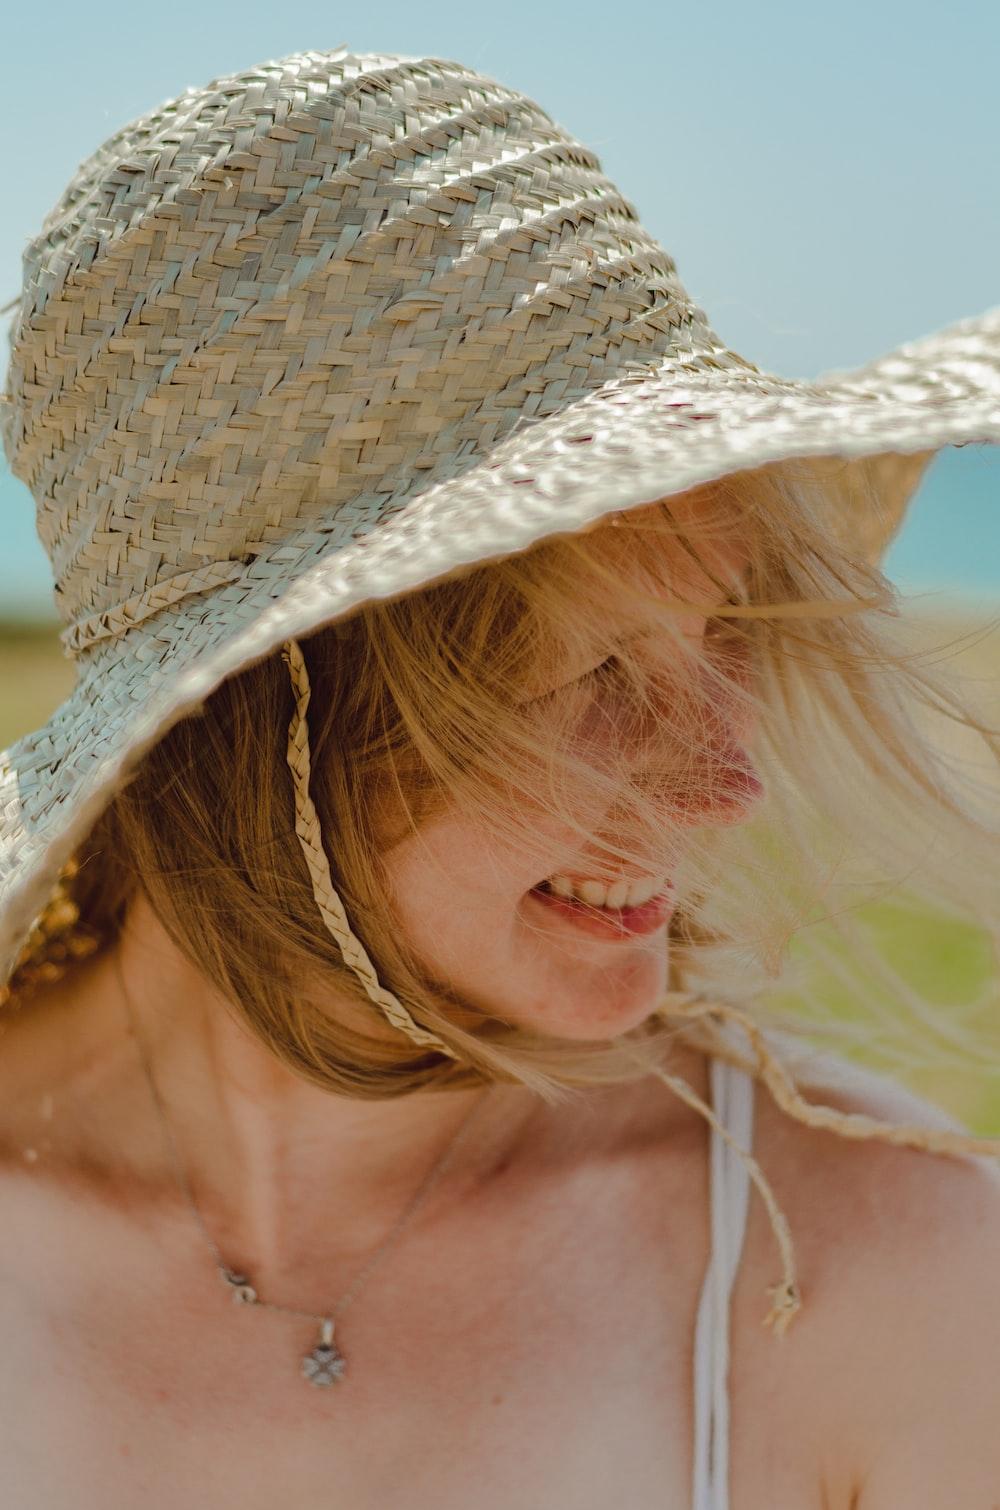 smiling woman wearing gray sun hat